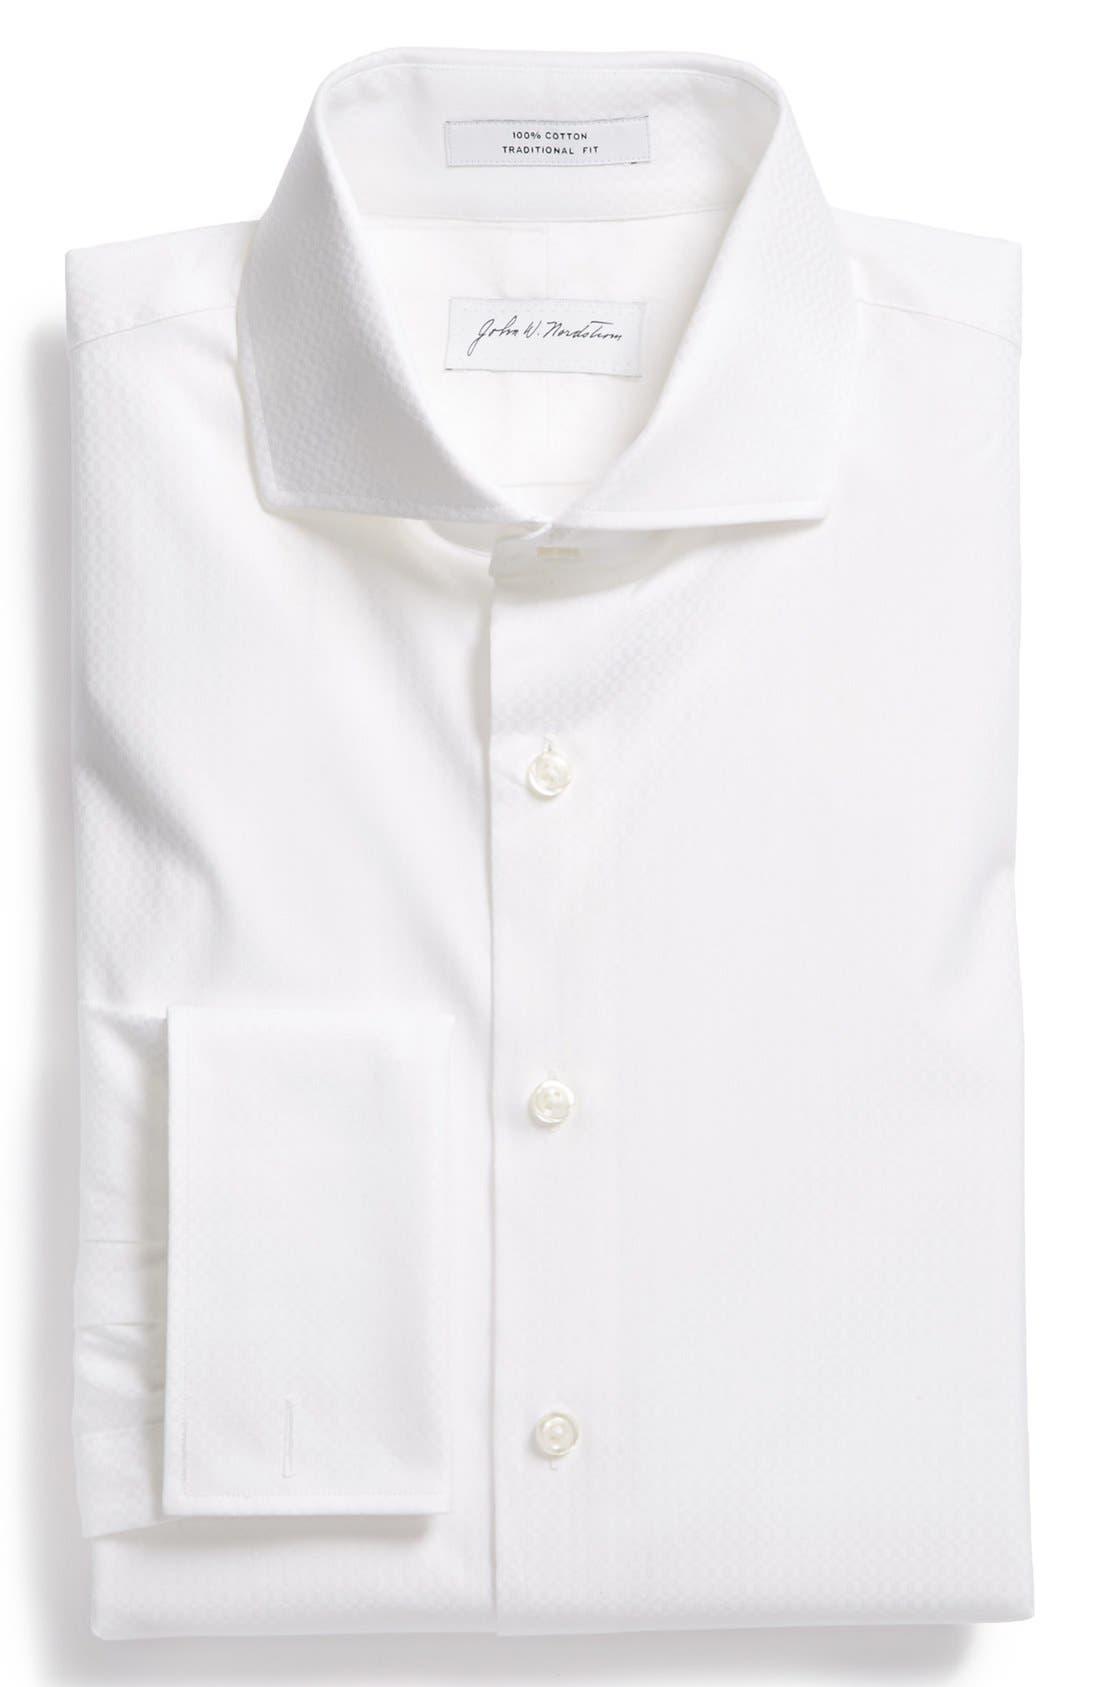 Main Image - John W. Nordstrom® Traditional Fit Tuxedo Shirt